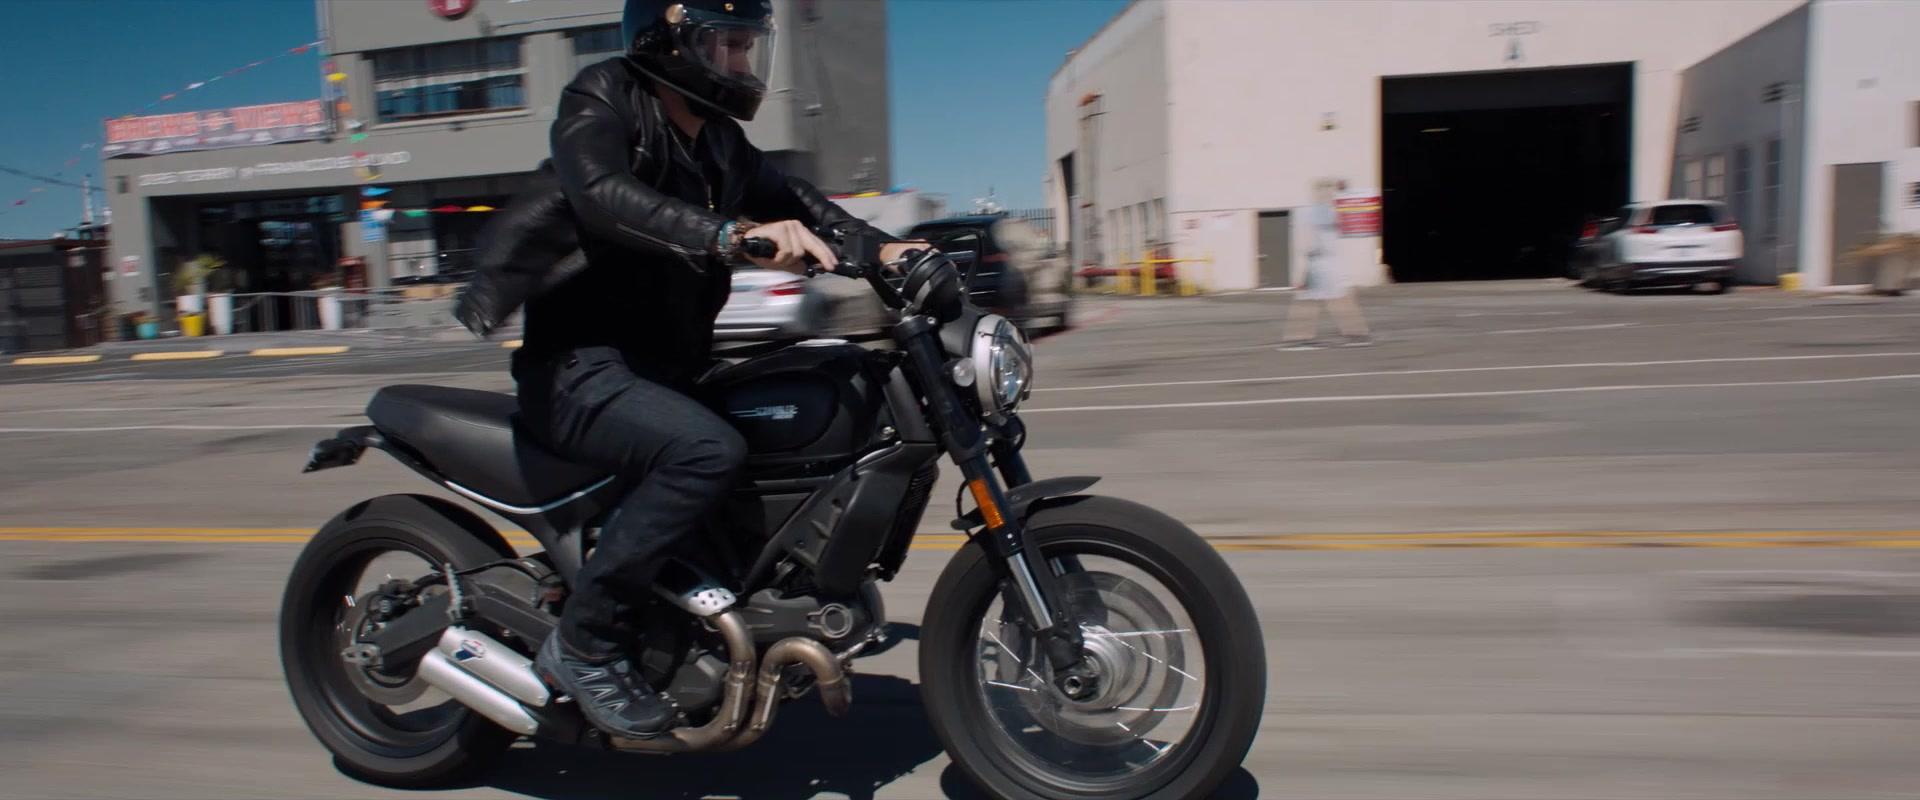 Ducati Scrambler Motorcycle Used by Tom Hardy in Venom (2018)